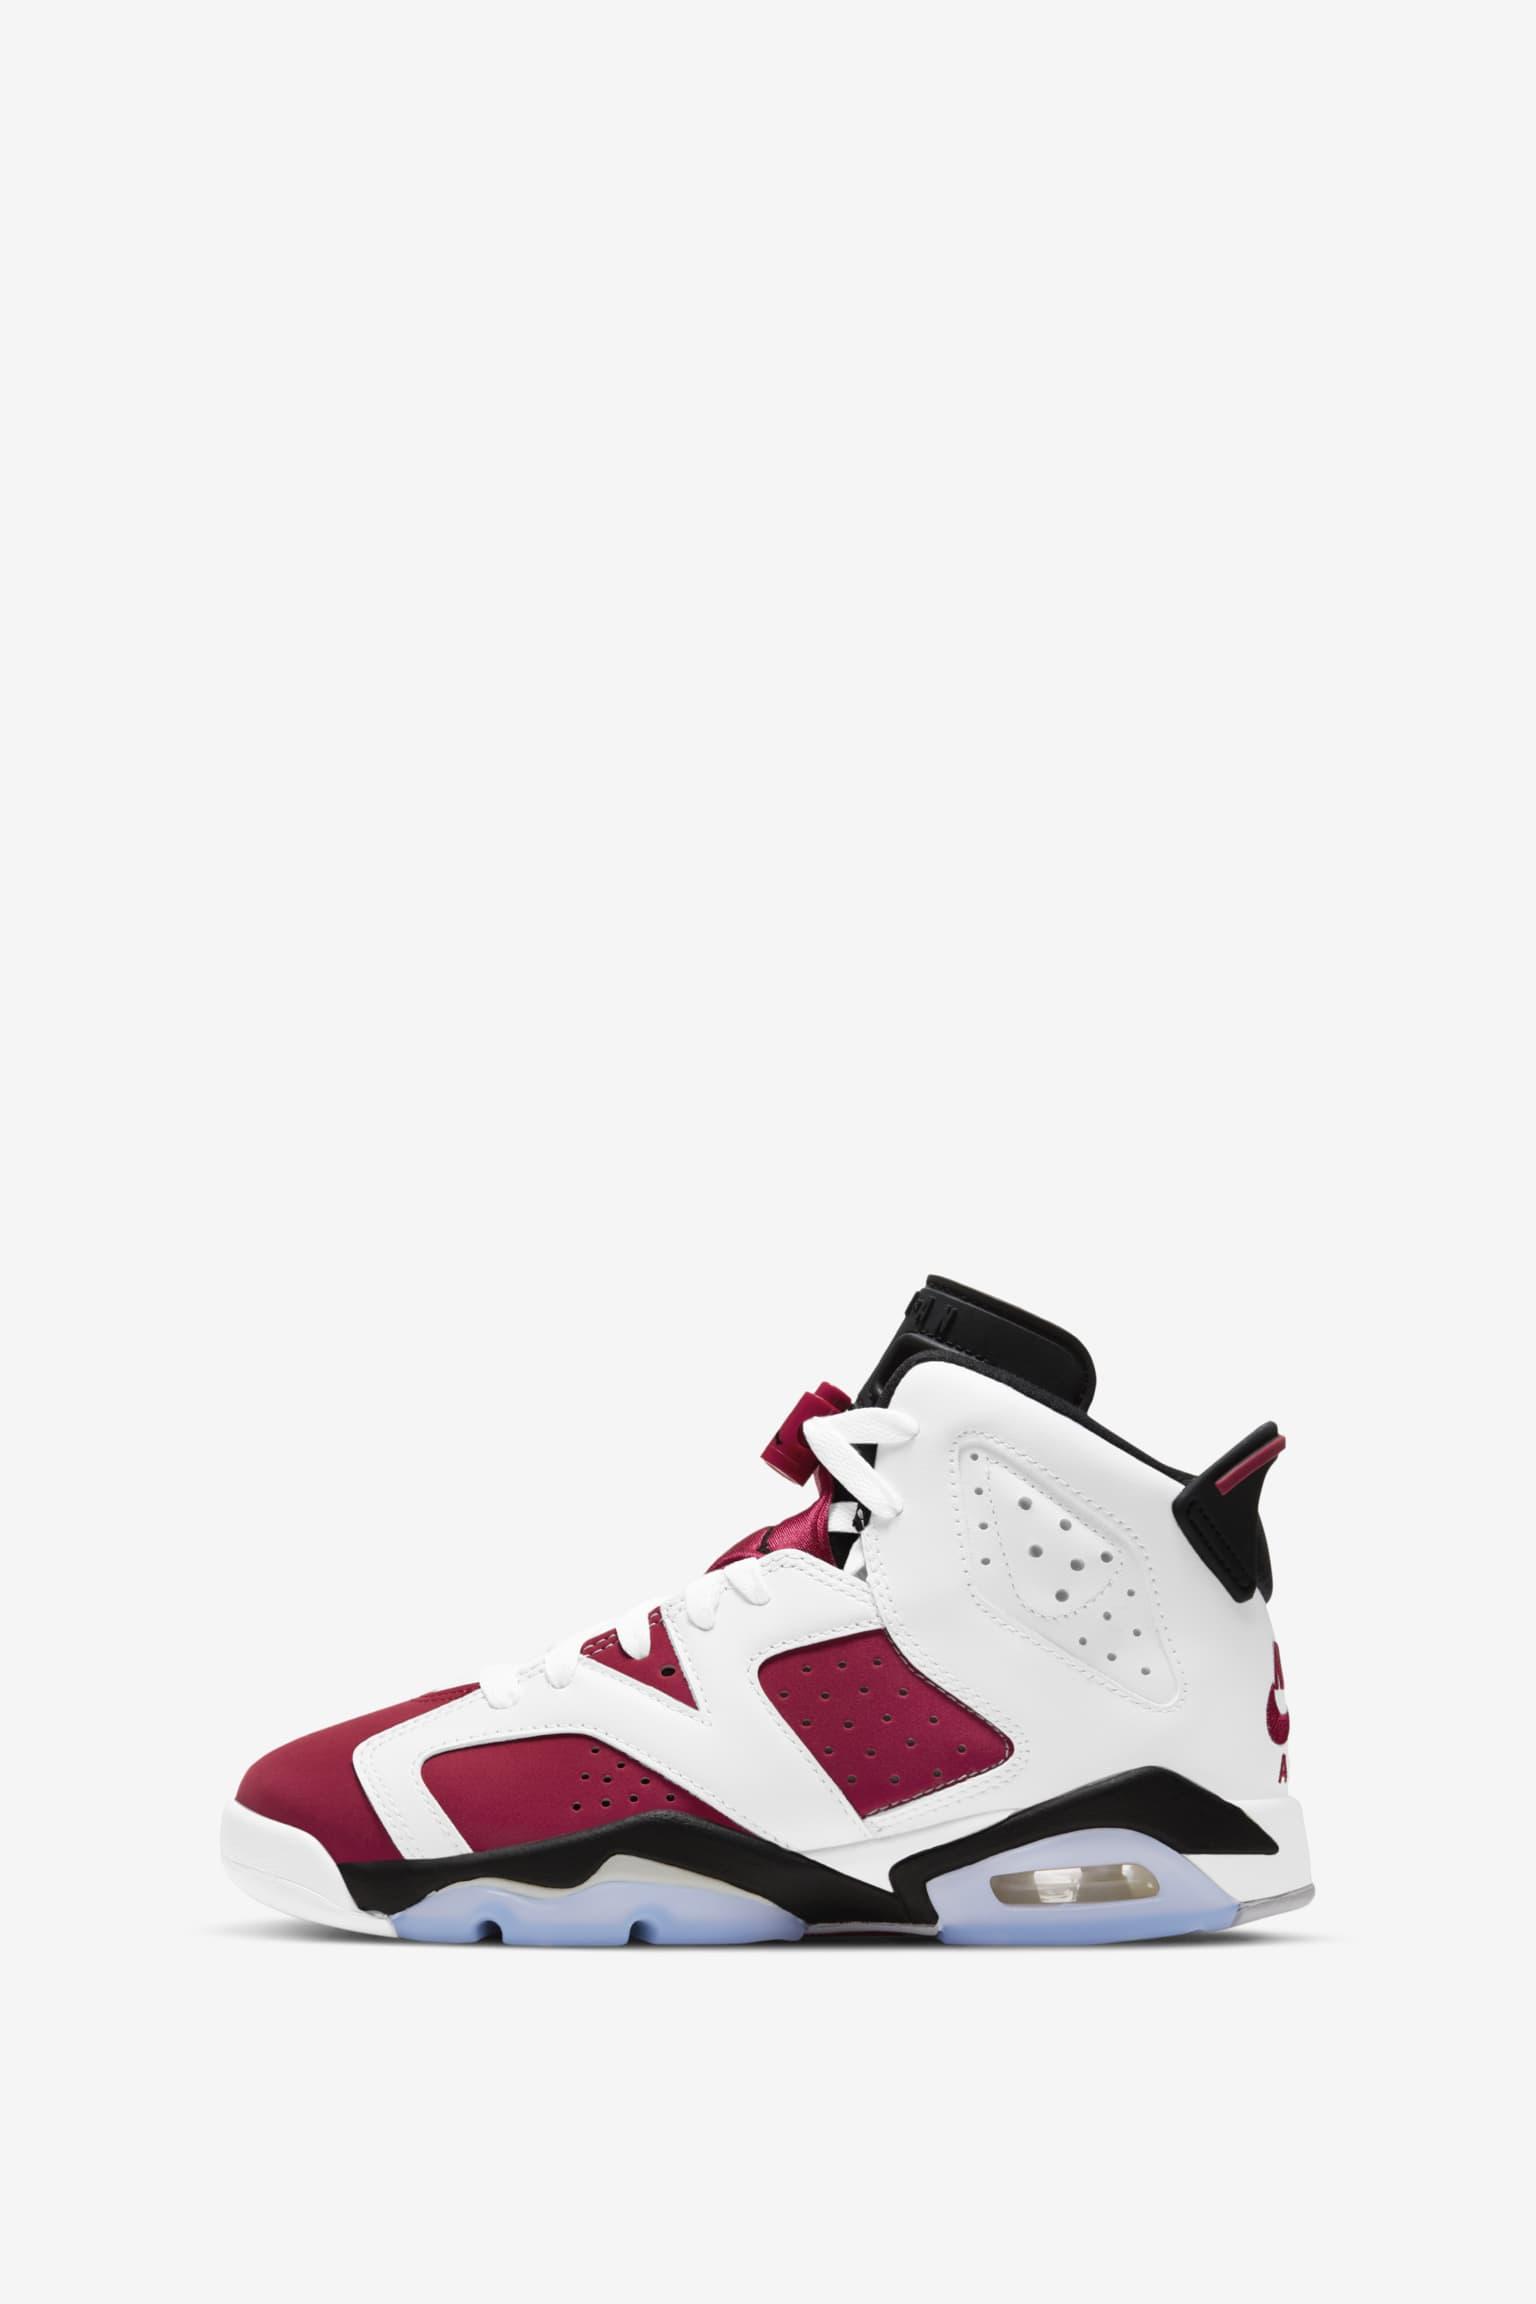 Air Jordan 6 'Carmine' Release Date . Nike SNKRS